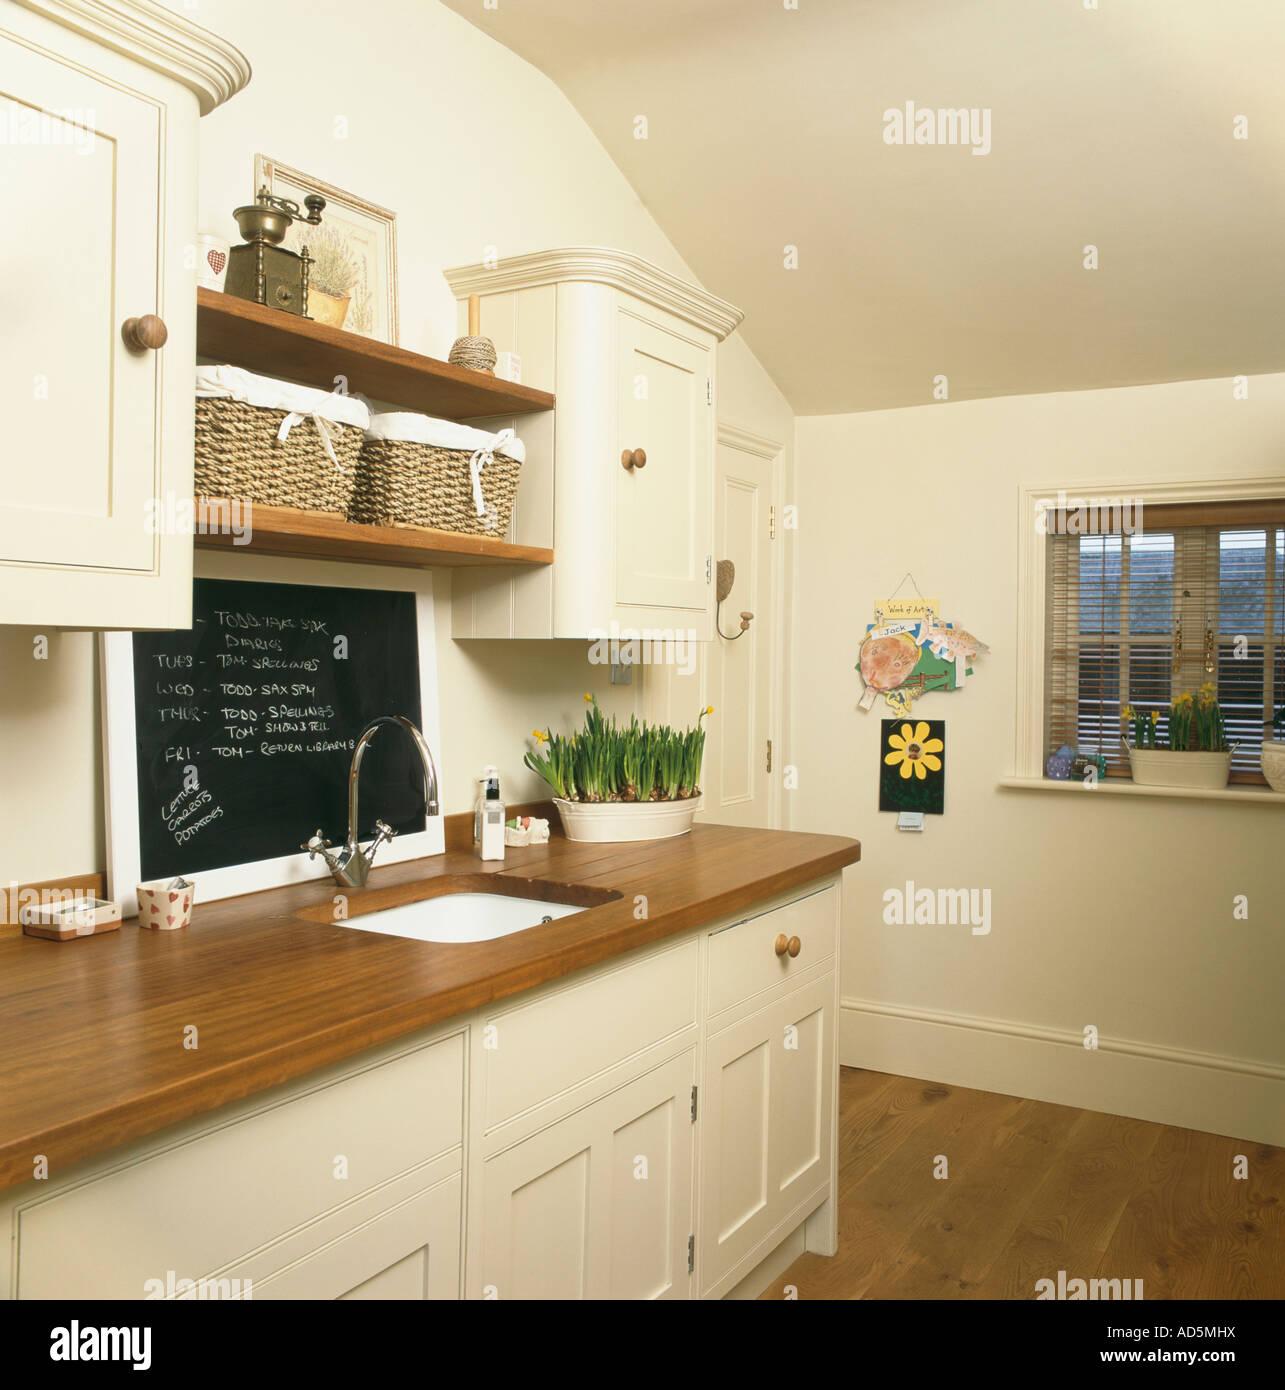 Cream Kitchen Inside Home In Imágenes De Stock & Cream Kitchen ...